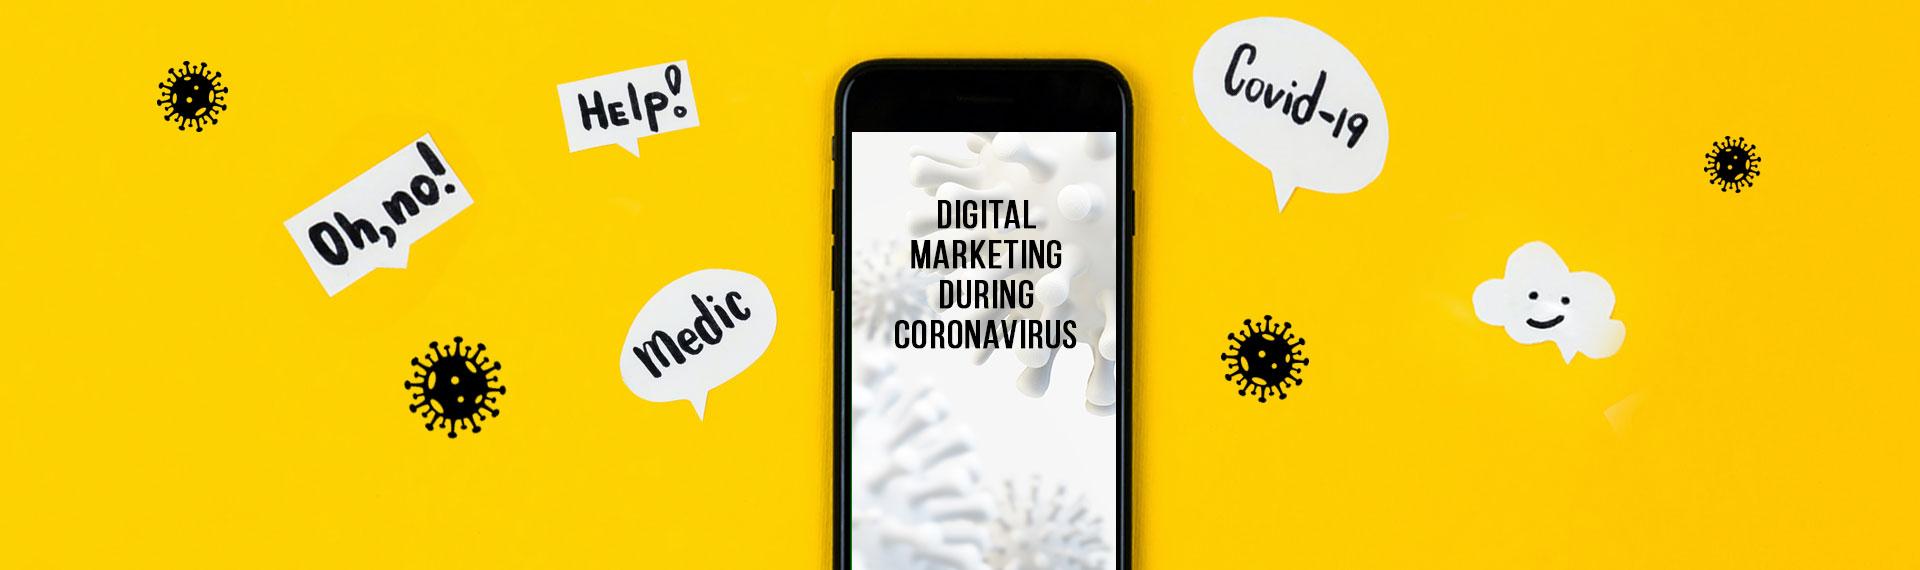 Covid19 and digital marketing